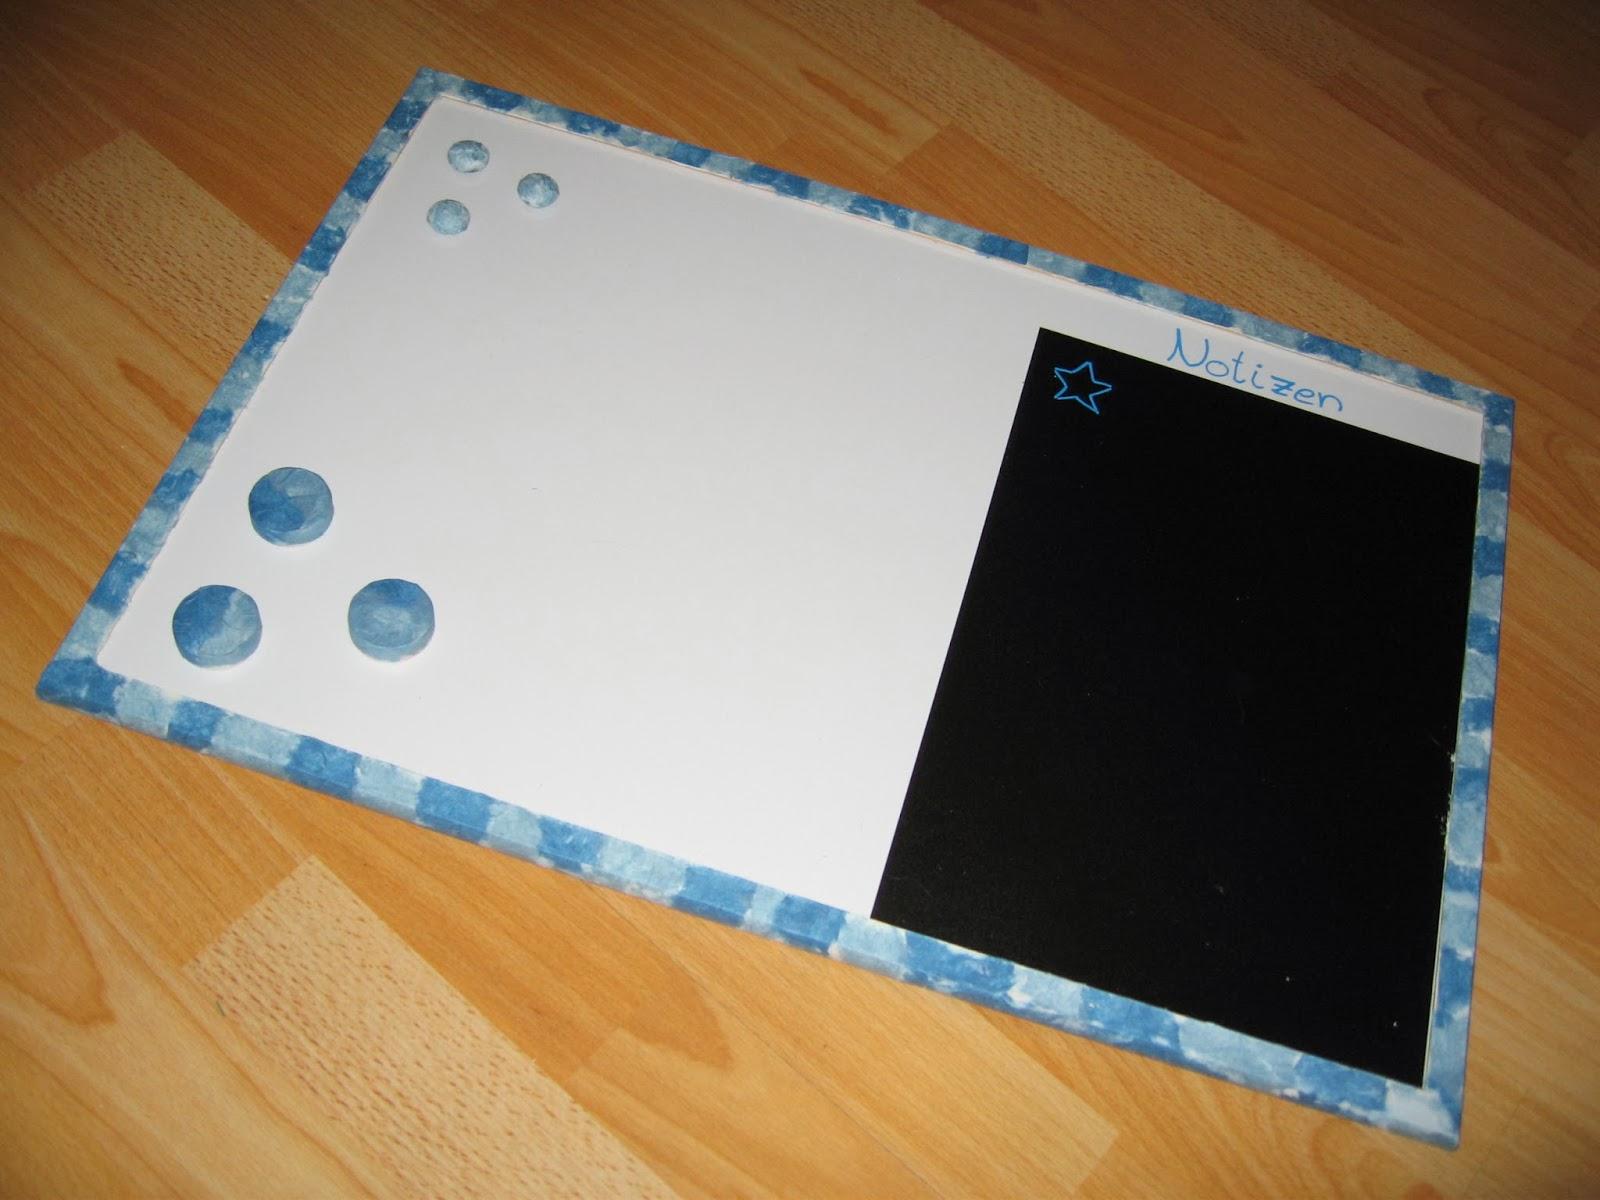 jazz kreative kunstecke magnettafel kreativ selbst gestalten. Black Bedroom Furniture Sets. Home Design Ideas